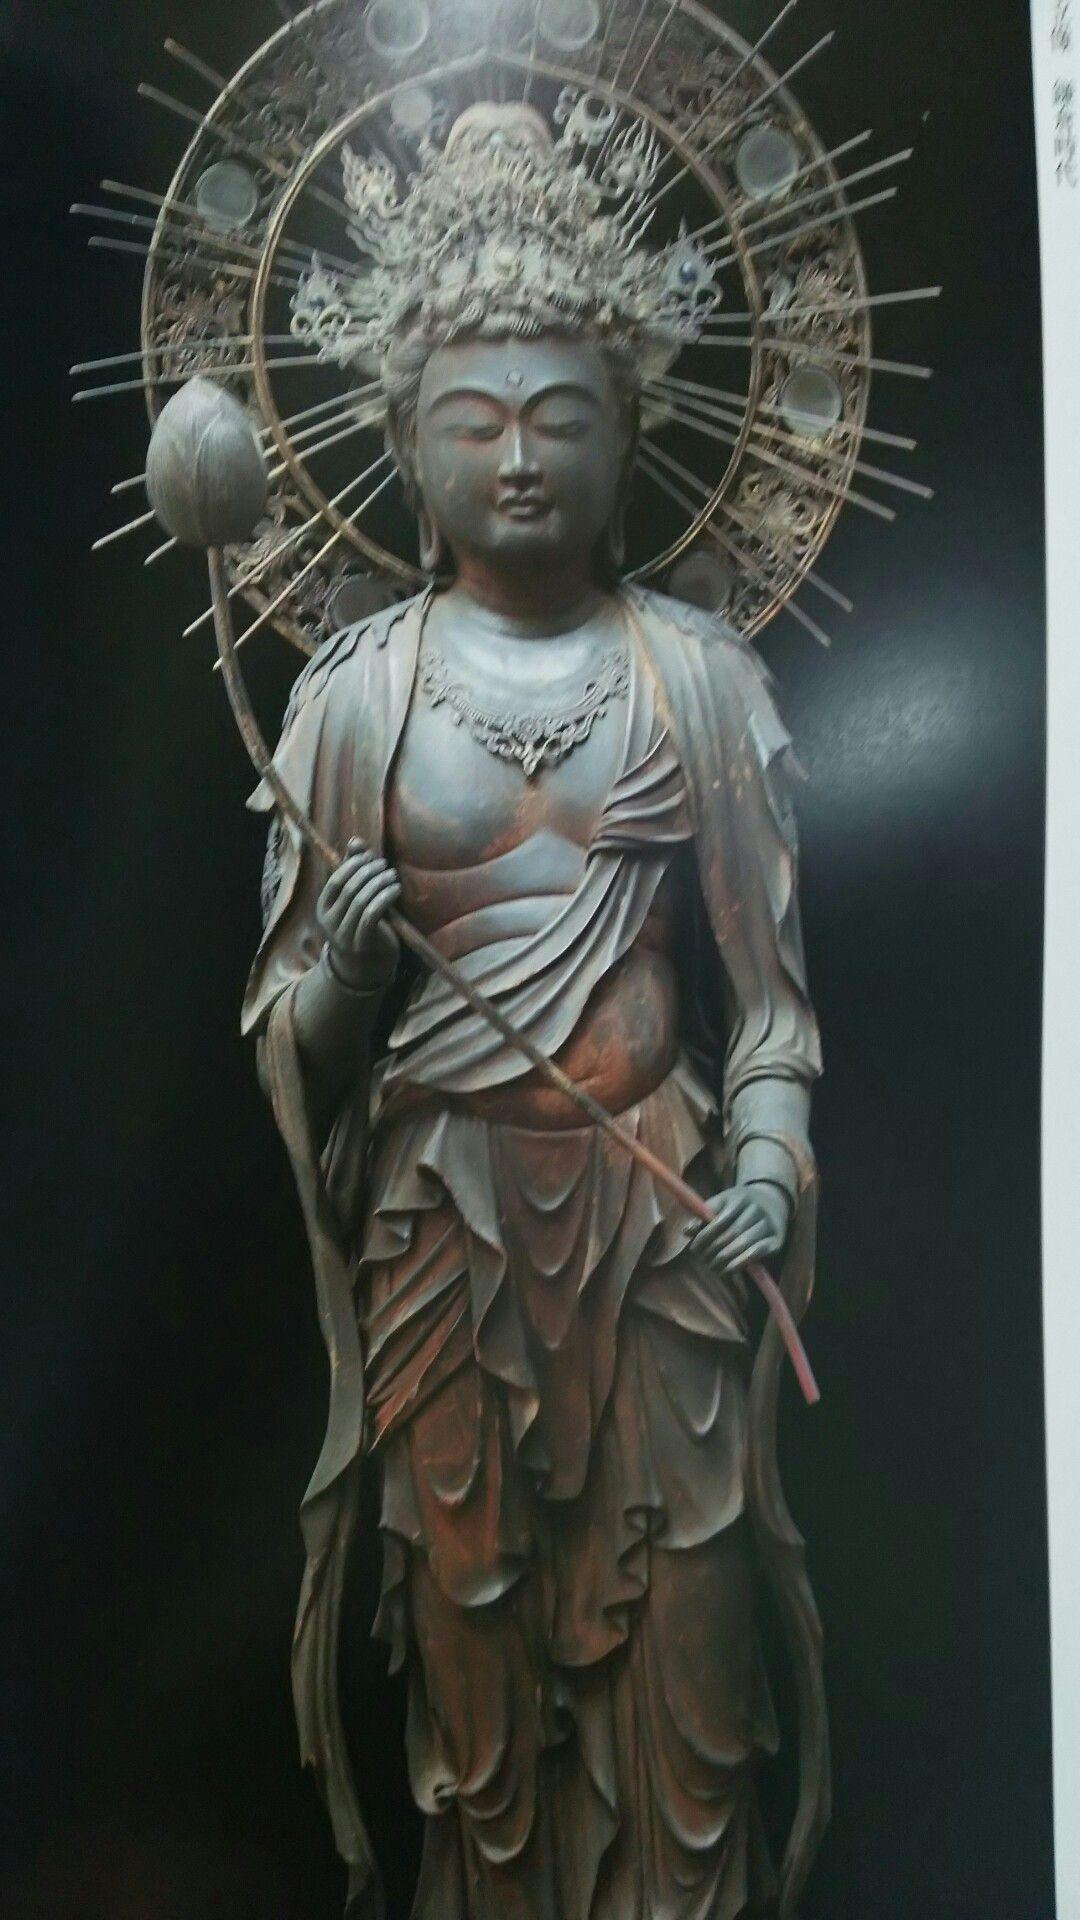 Pin de Vickey Mautner en ART Pinterest Budismo Siddharta y Deidades